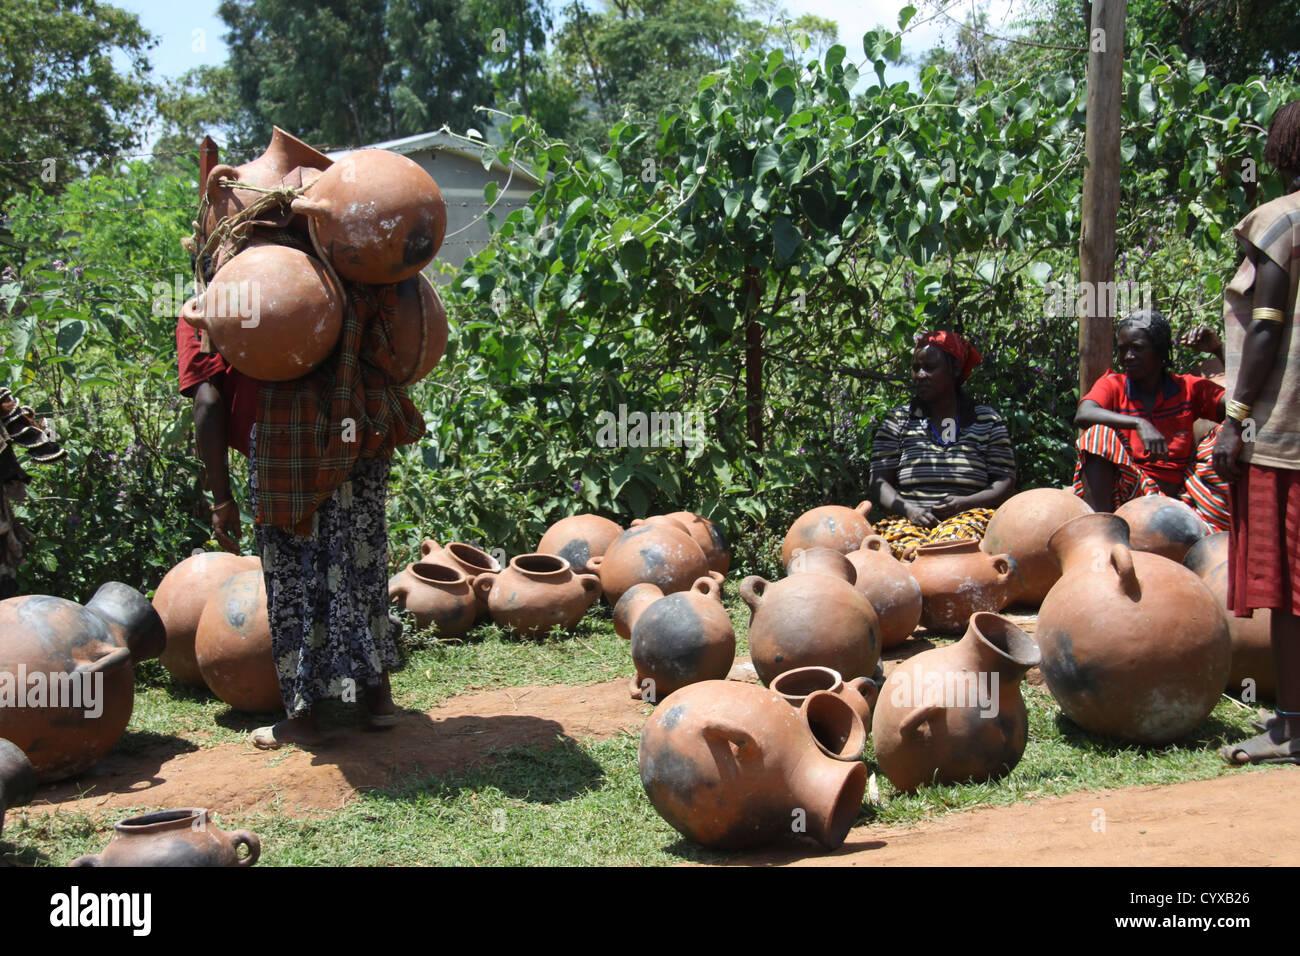 Ethiopia. Omo Valley, Bana Tribe Market Terracota pots - Stock Image